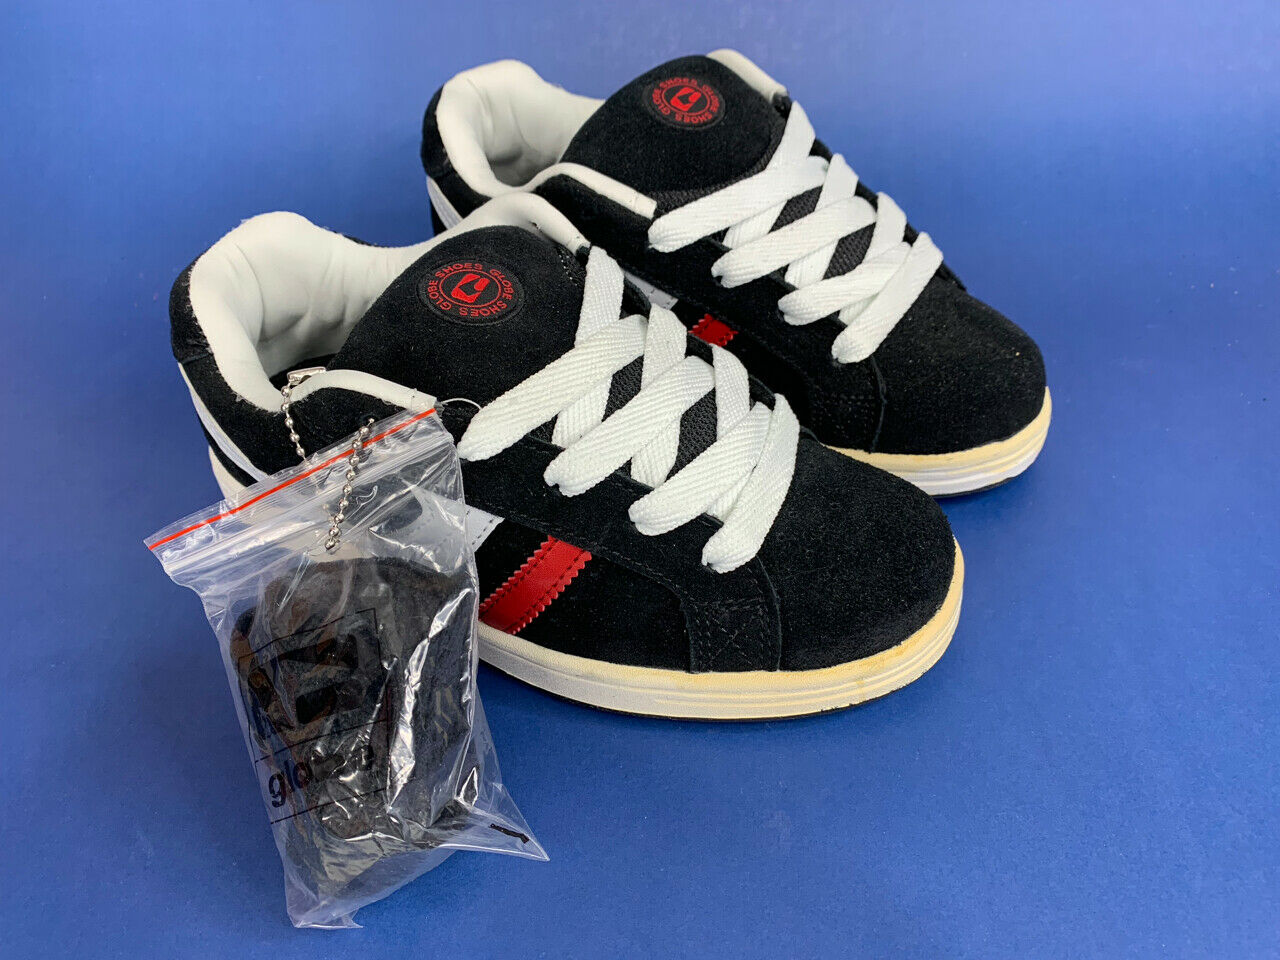 NEW GLOBE BLITZ KIDS Skateboard Skate Shoes Size 4.0 NOS No